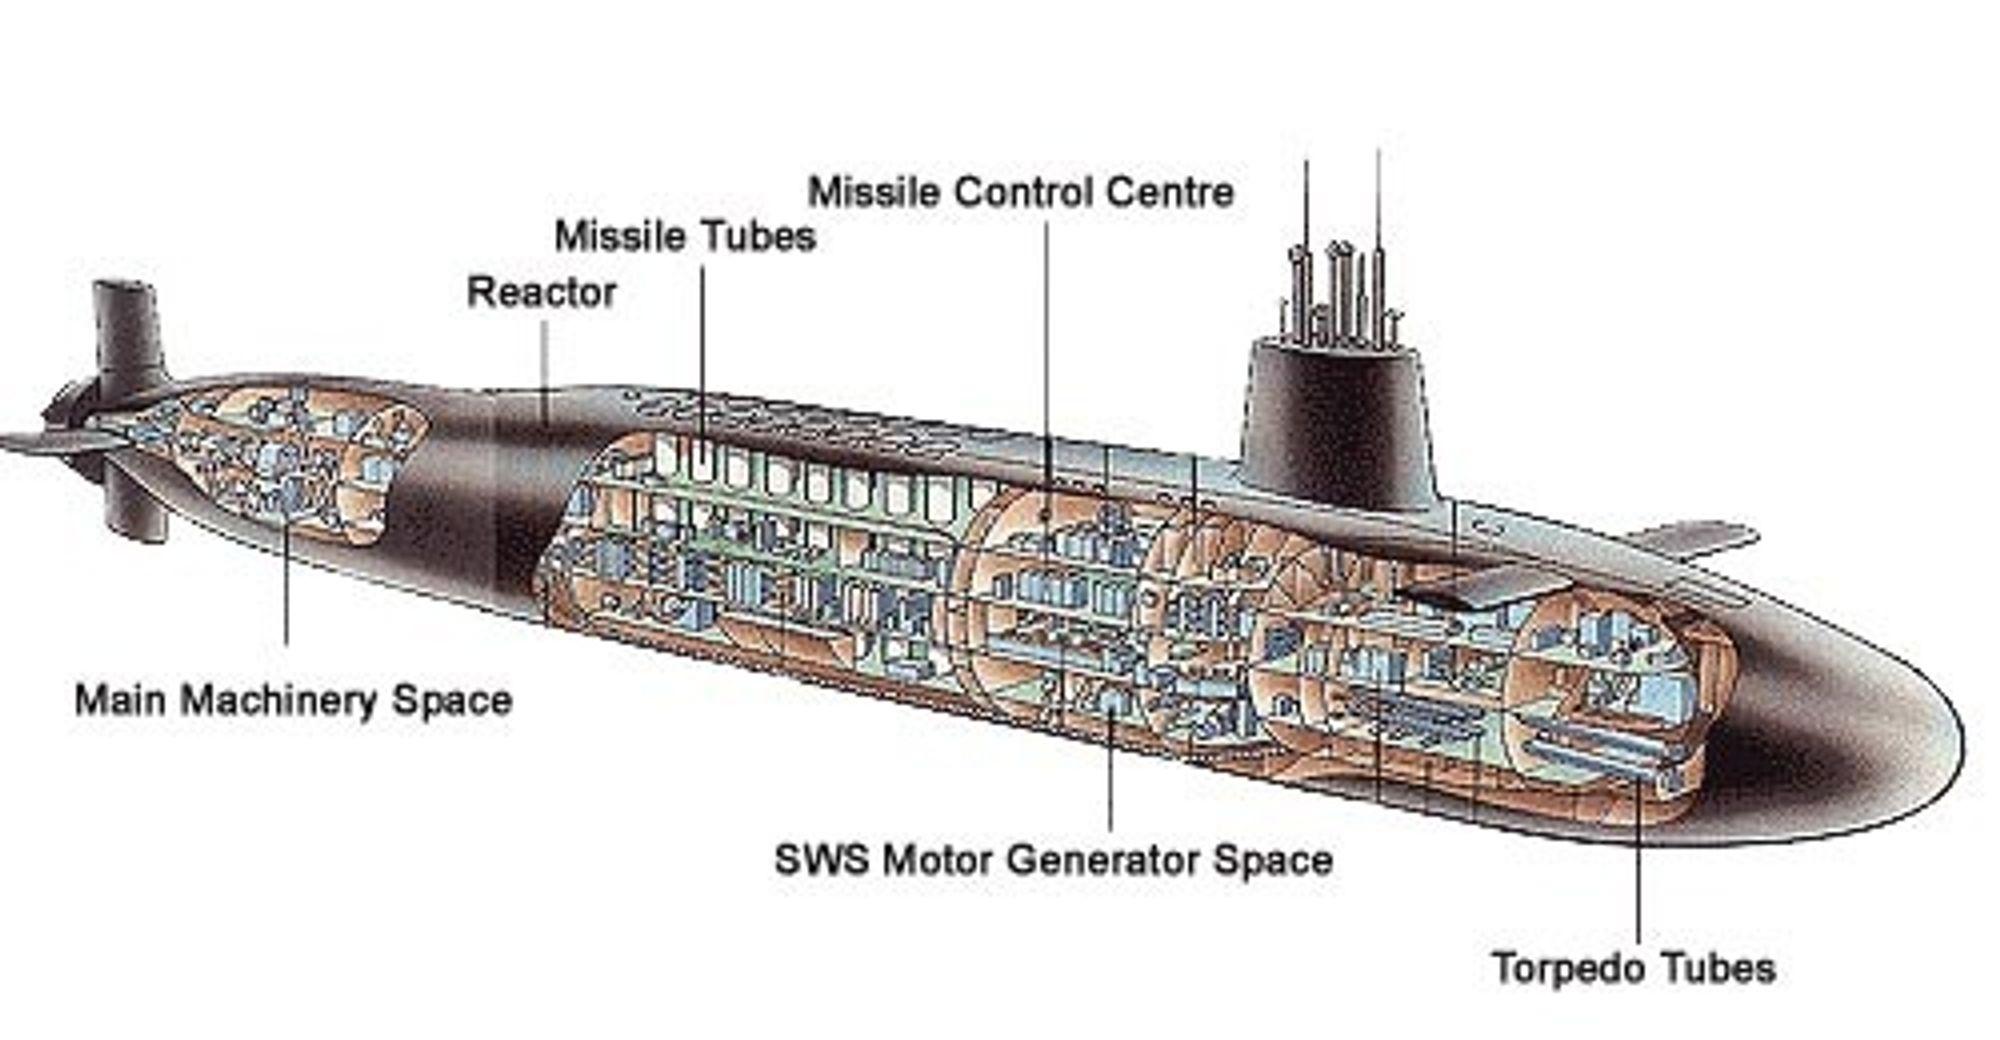 Skisse over ubåt i Vanguard-klassen. Bilde: Royal Navy